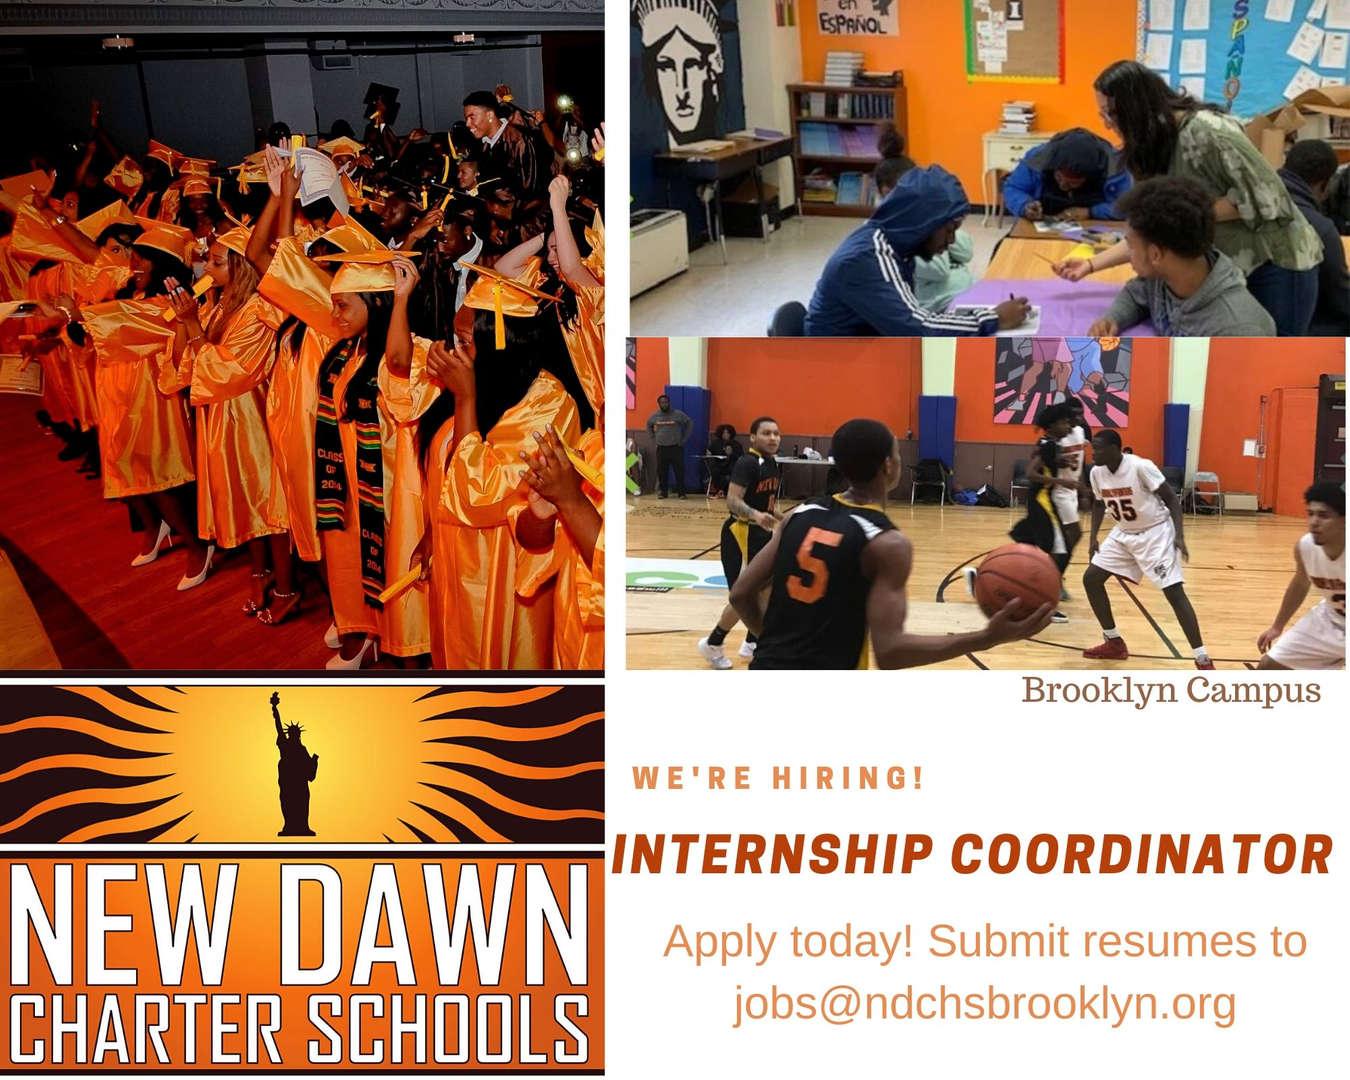 Internship Coordinator